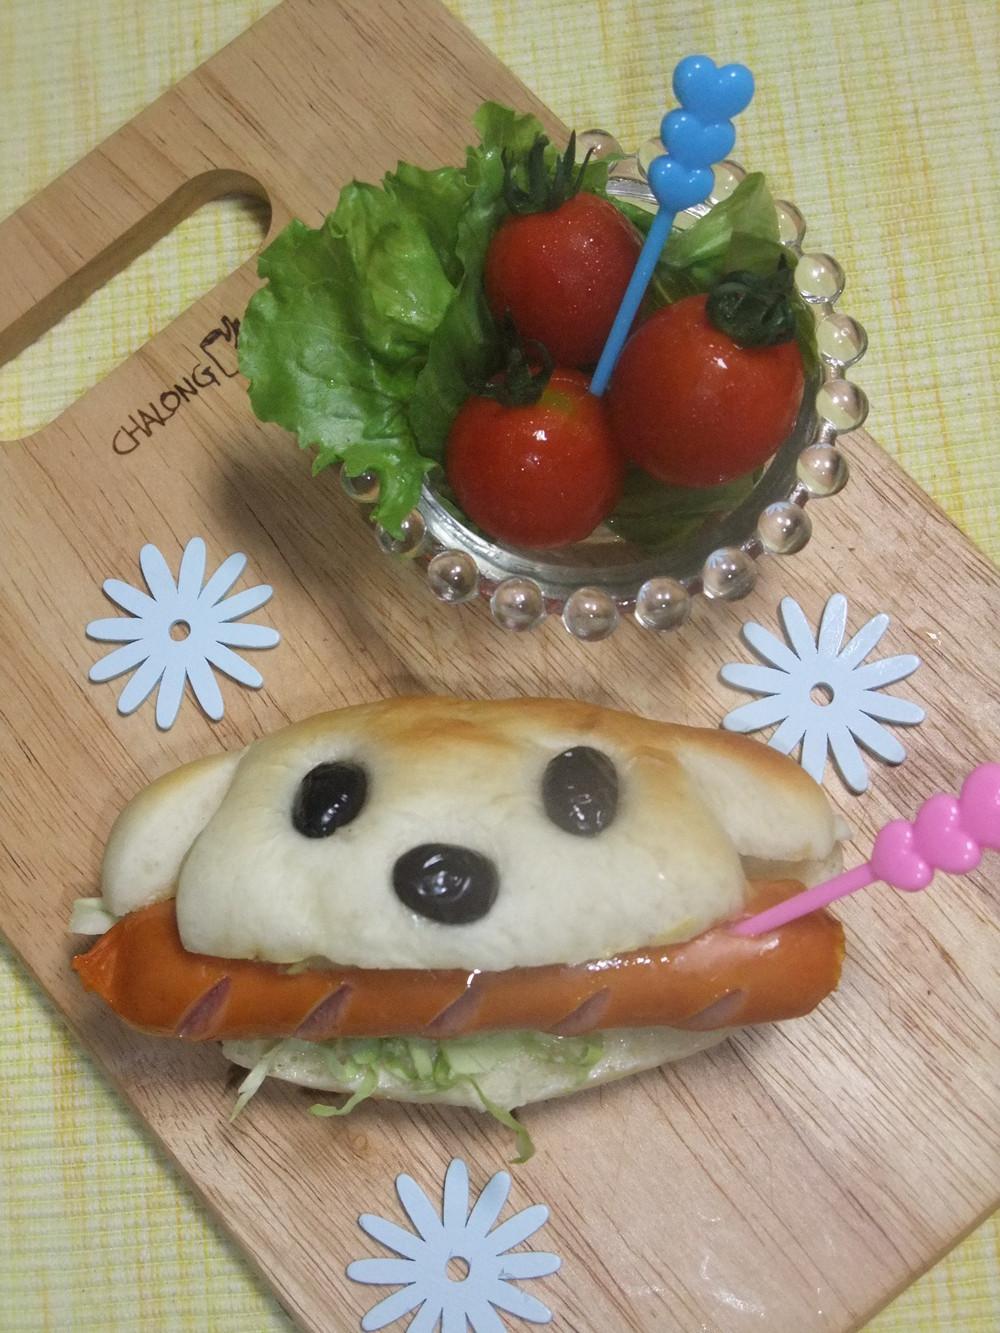 How To Make Dog Shaped Hot Dog Sandwich